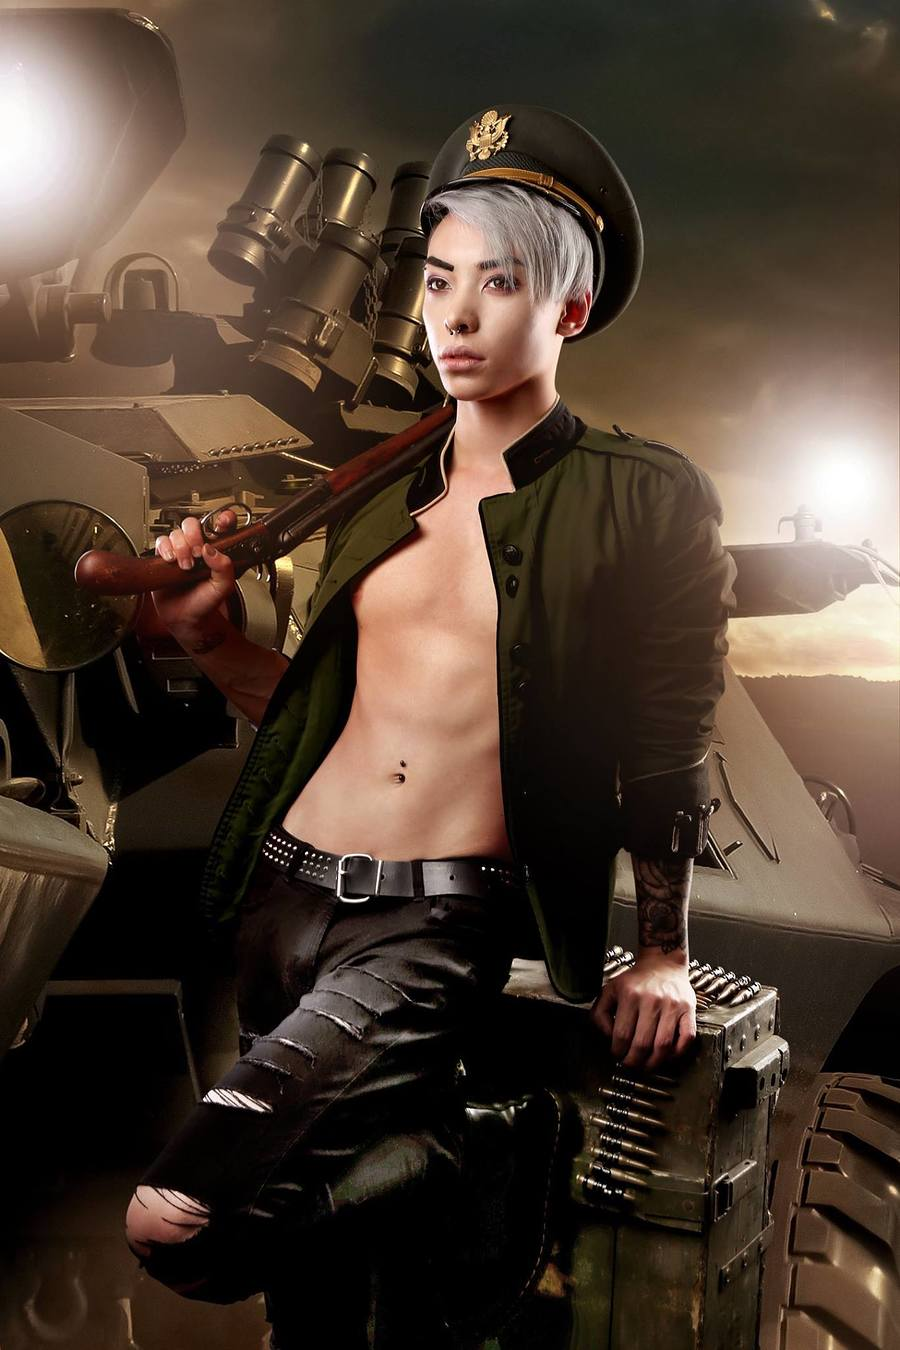 Combat Baby / Model Kuro / Uploaded 21st May 2018 @ 08:56 PM